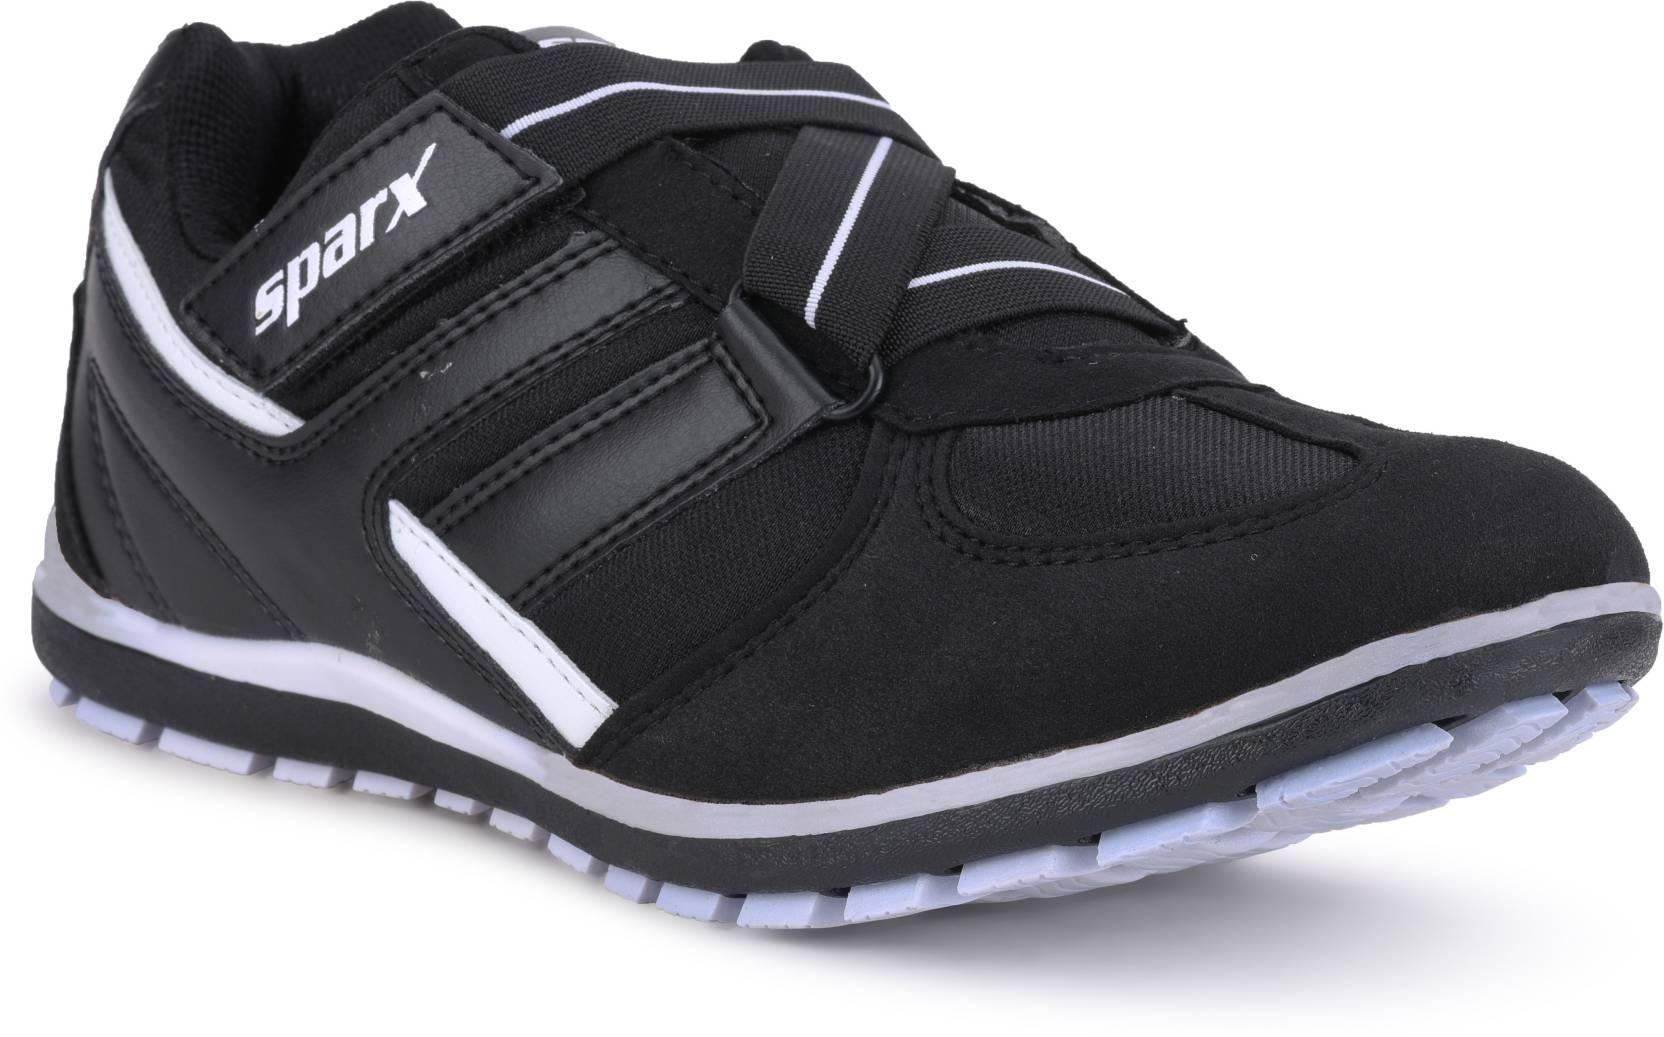 SparxSM-202 Sneakers For Men(White, Black)